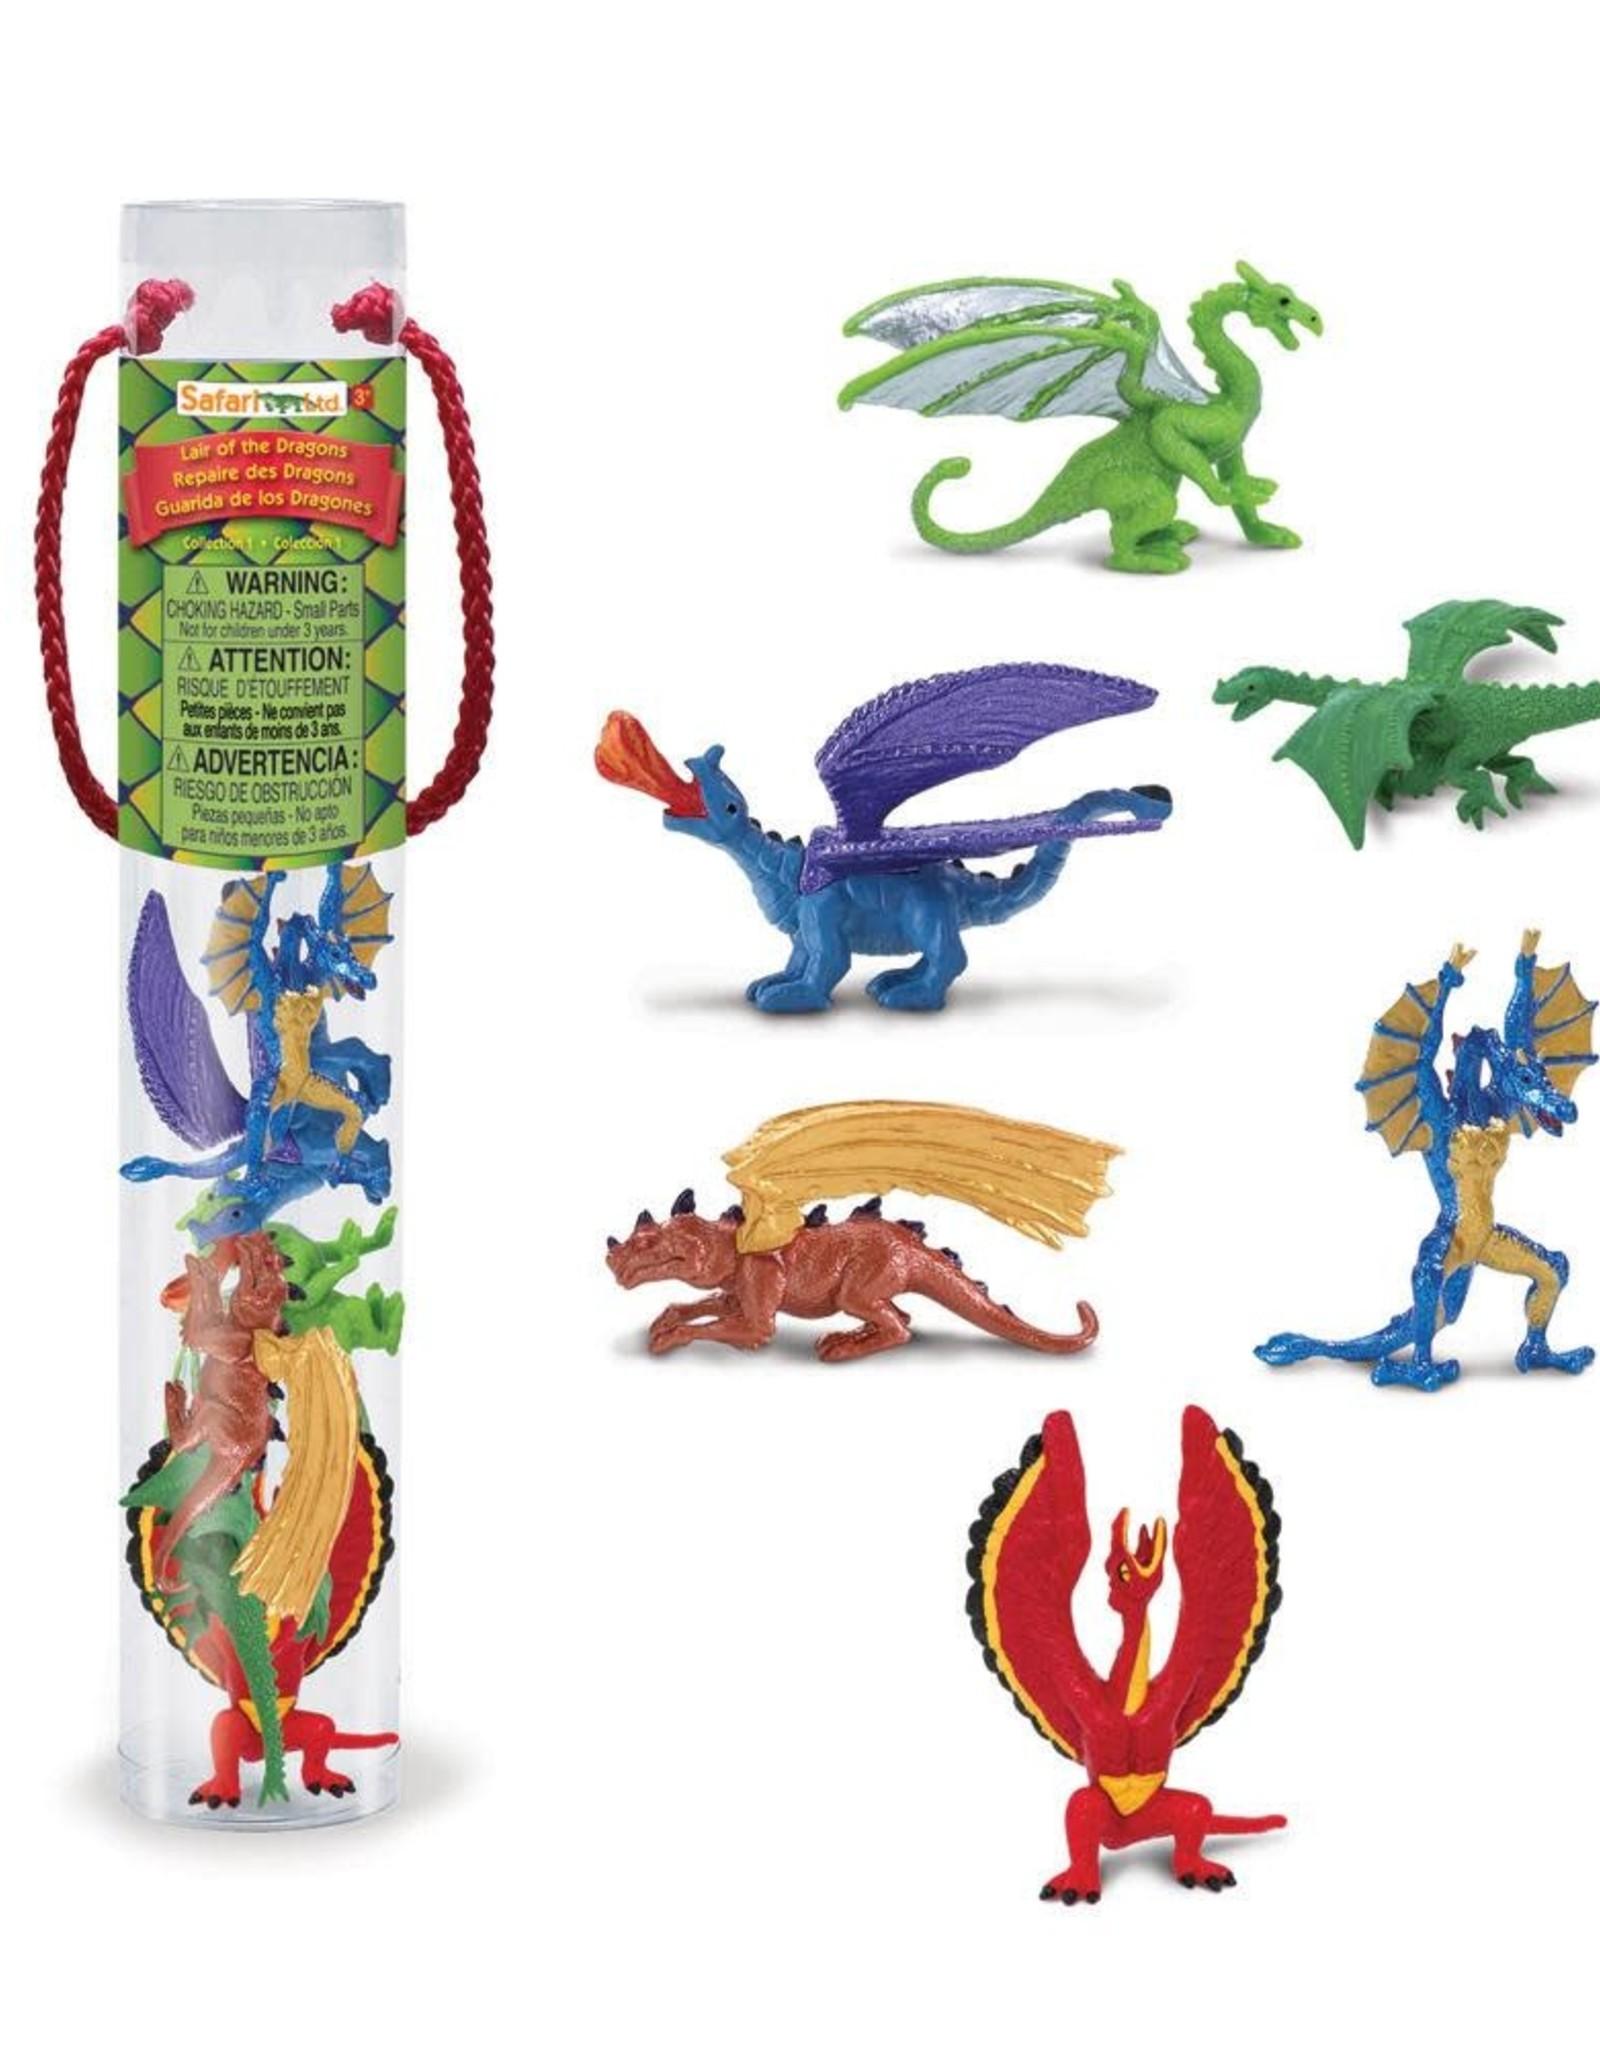 Safari Safari Designer Toob Lair of the Dragons Collection 1